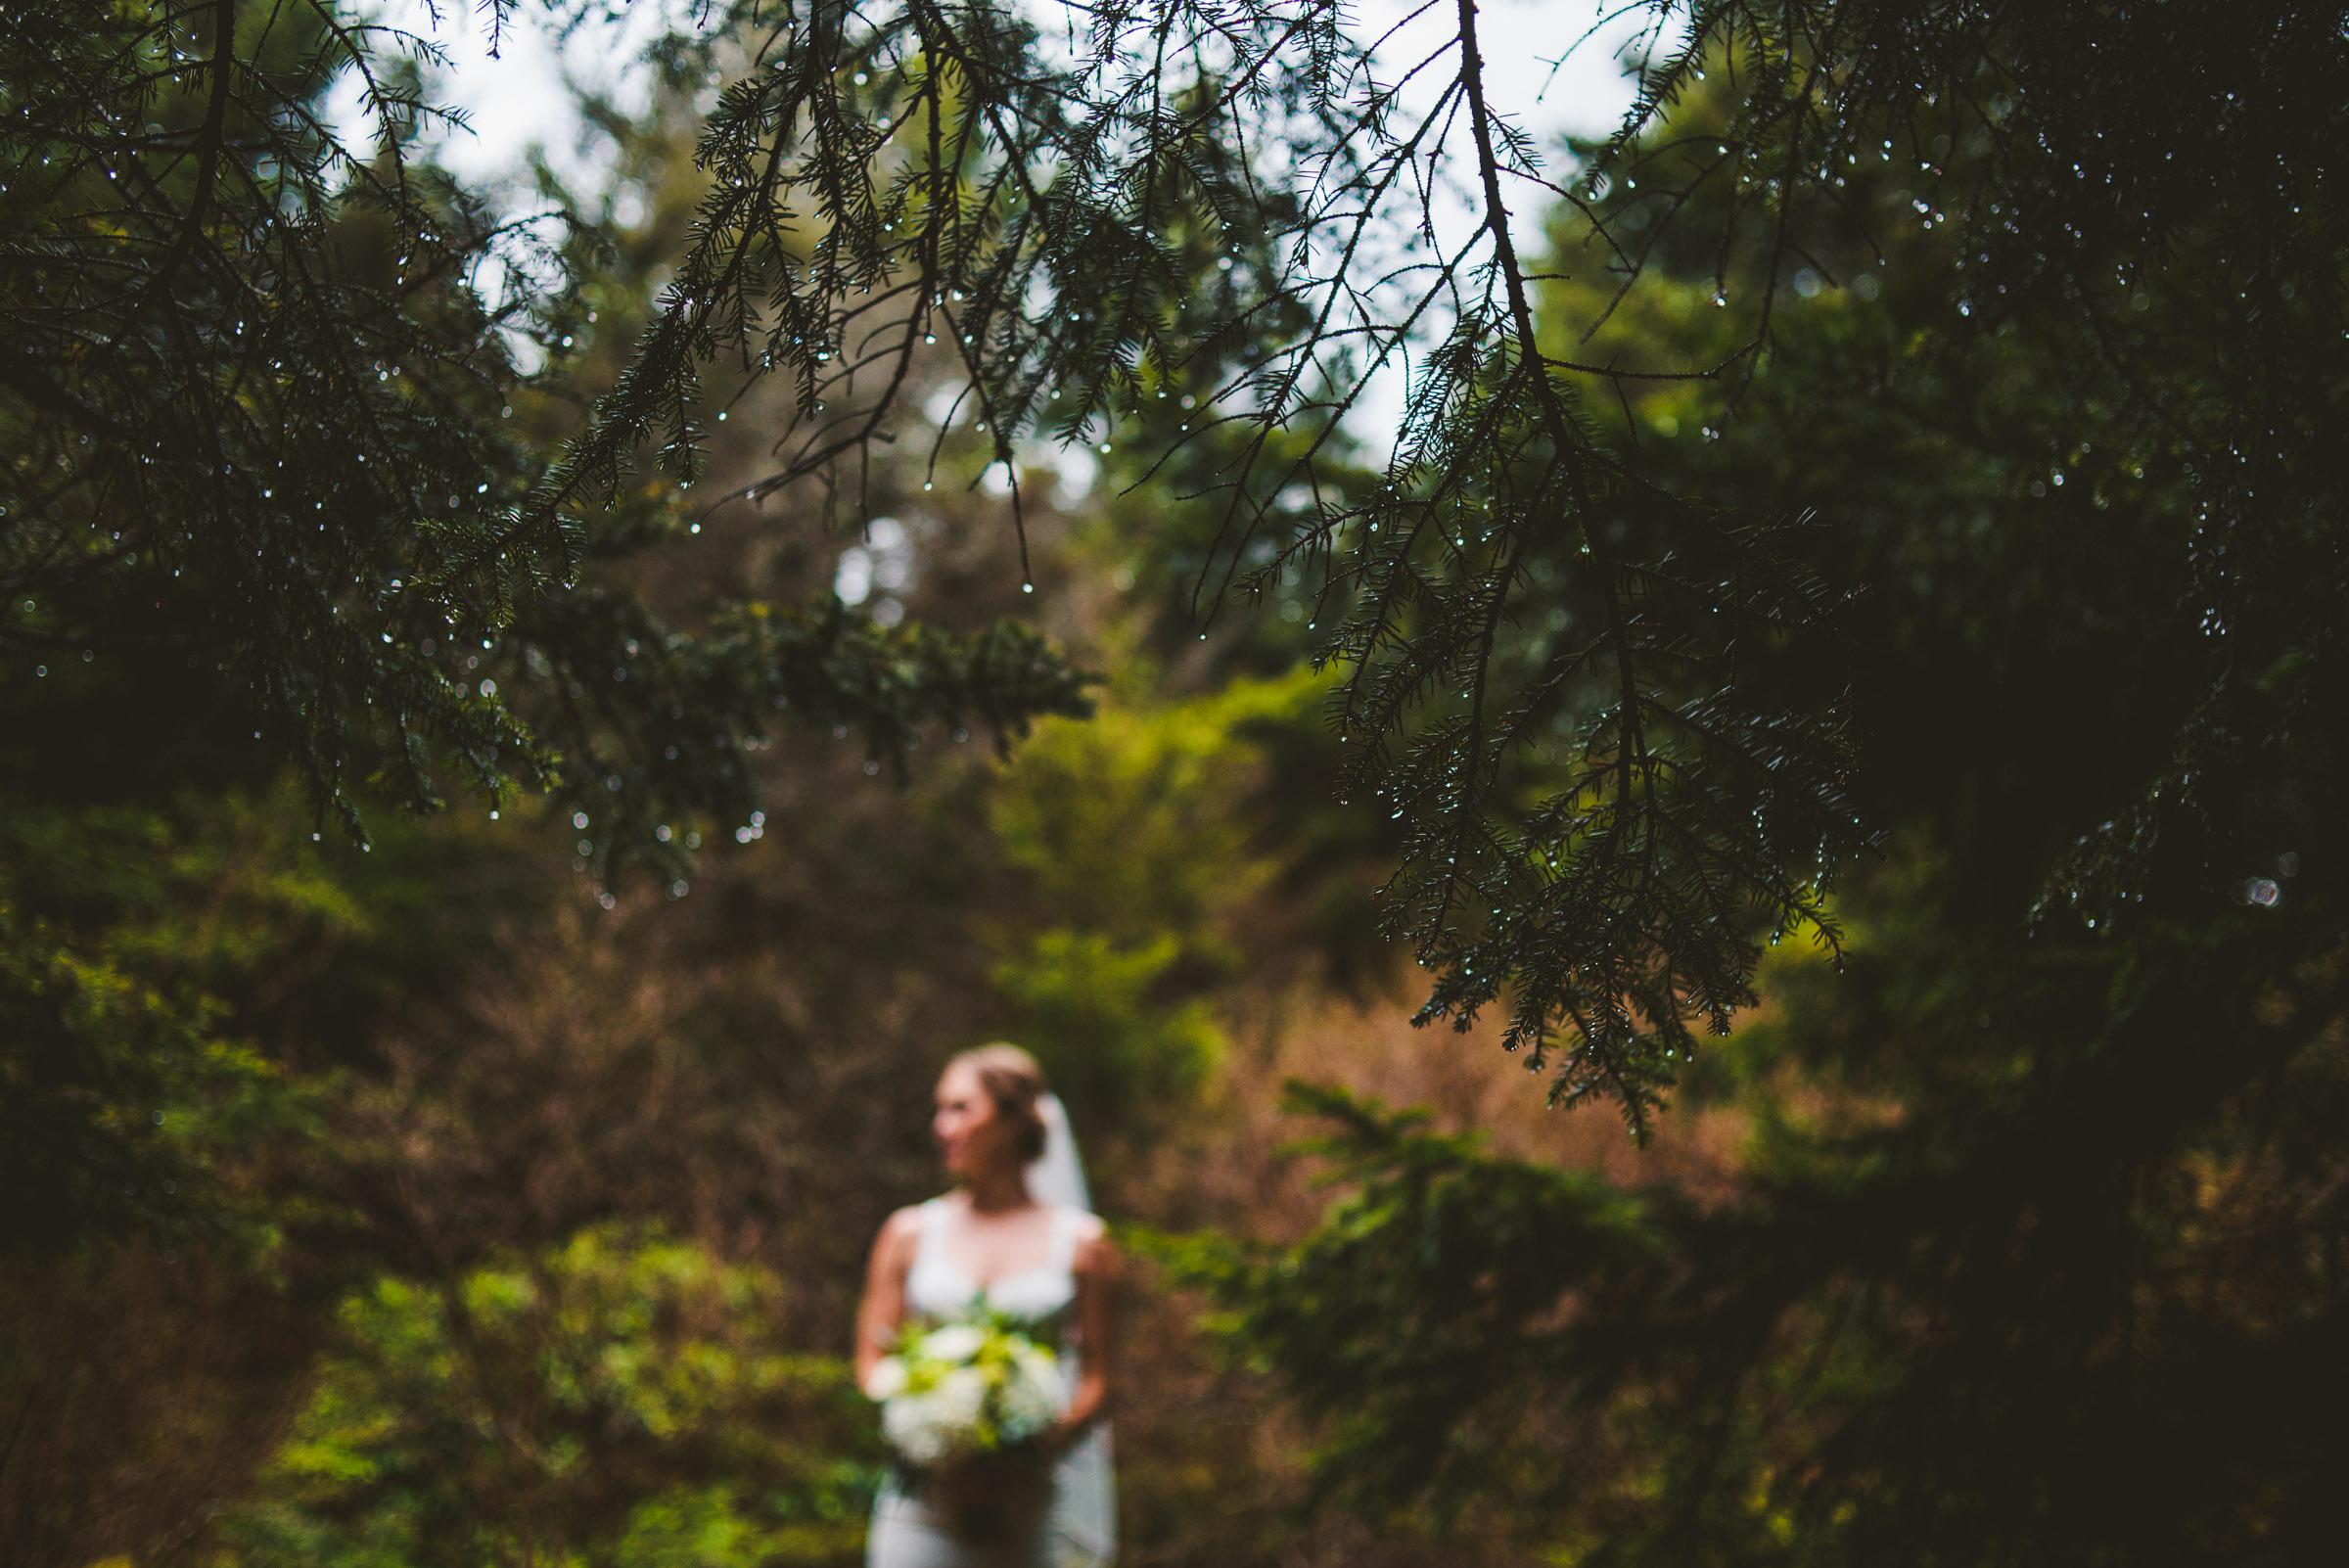 rain drops on a pine tree with an adventurous bride